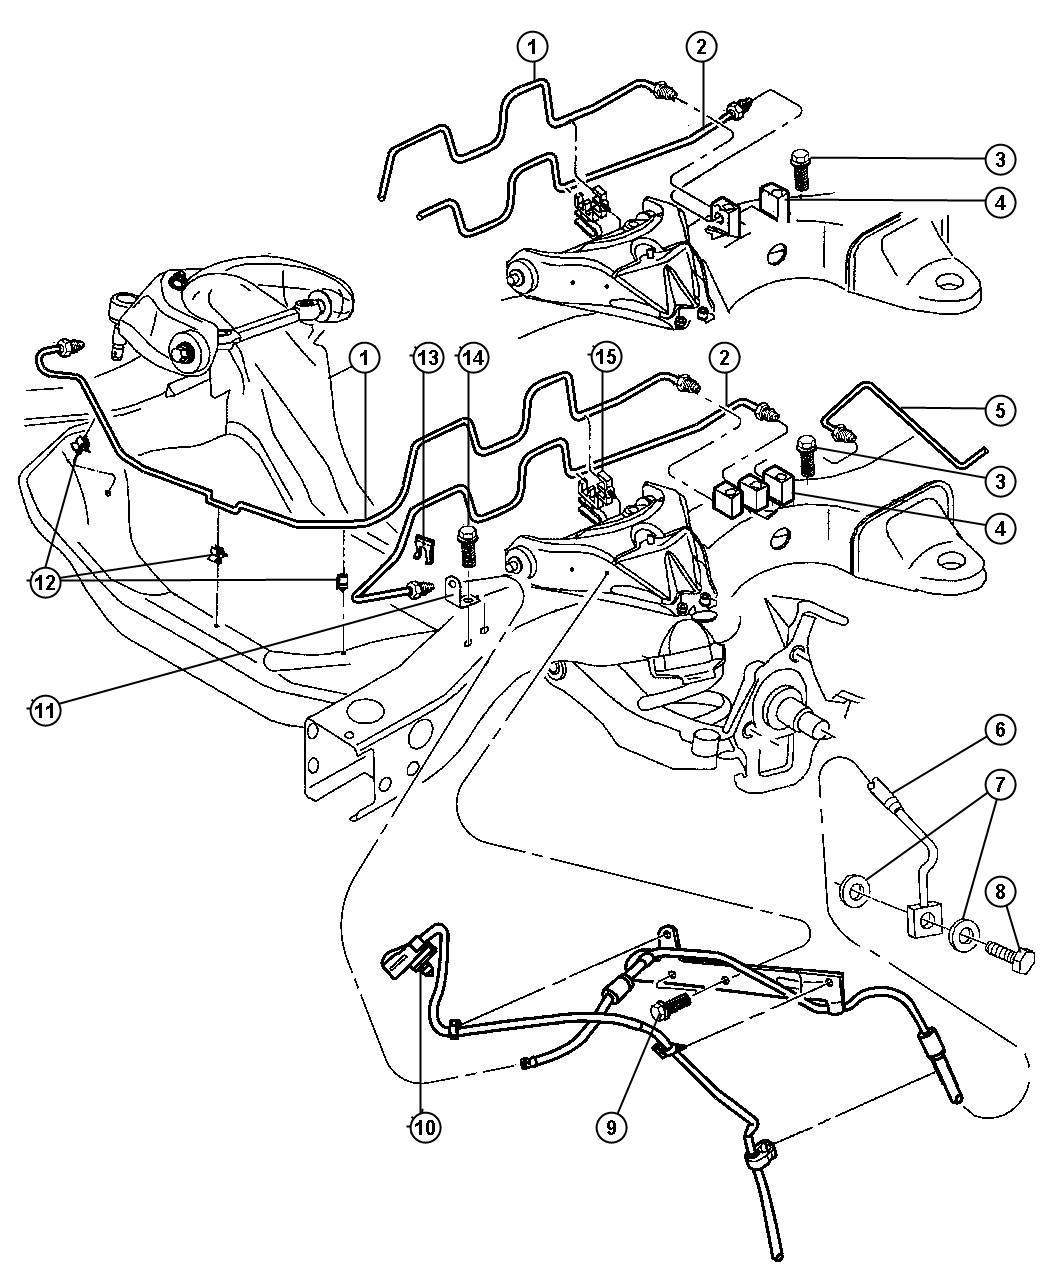 hight resolution of dodge dakota brake line diagram car interior design 2001 ford expedition brake line diagram dodge dakota rear brake diagram